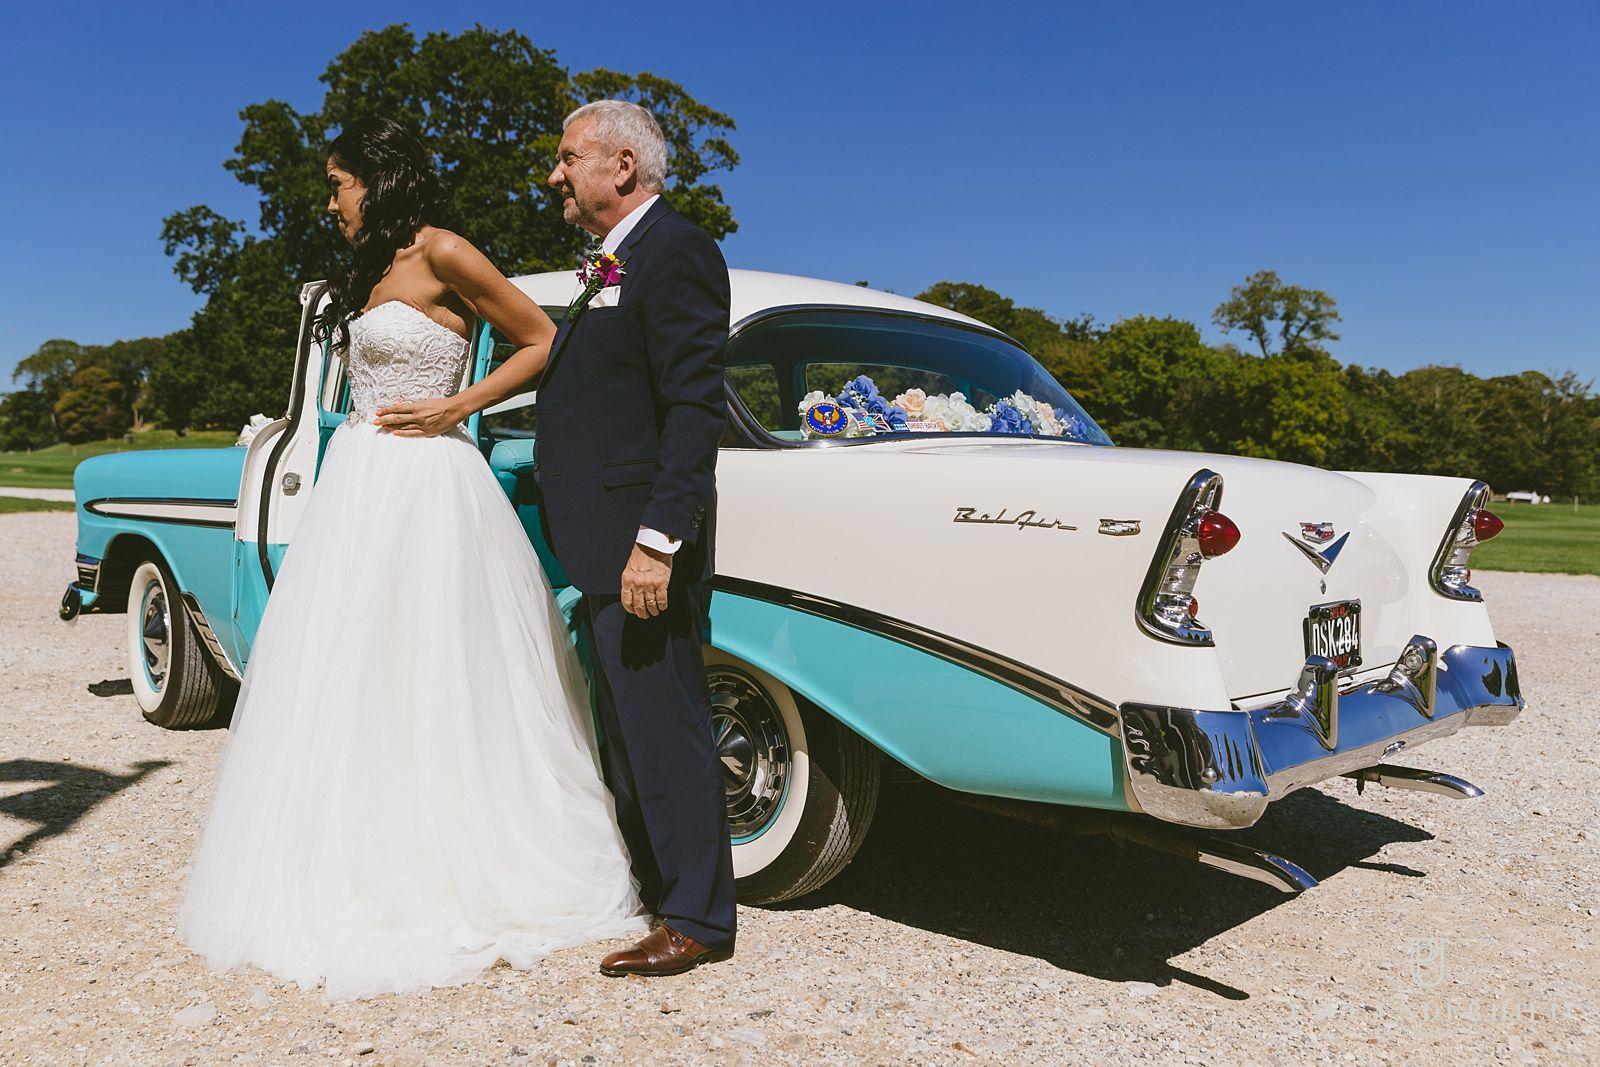 lulworth-castle-wedding-bride-arrives